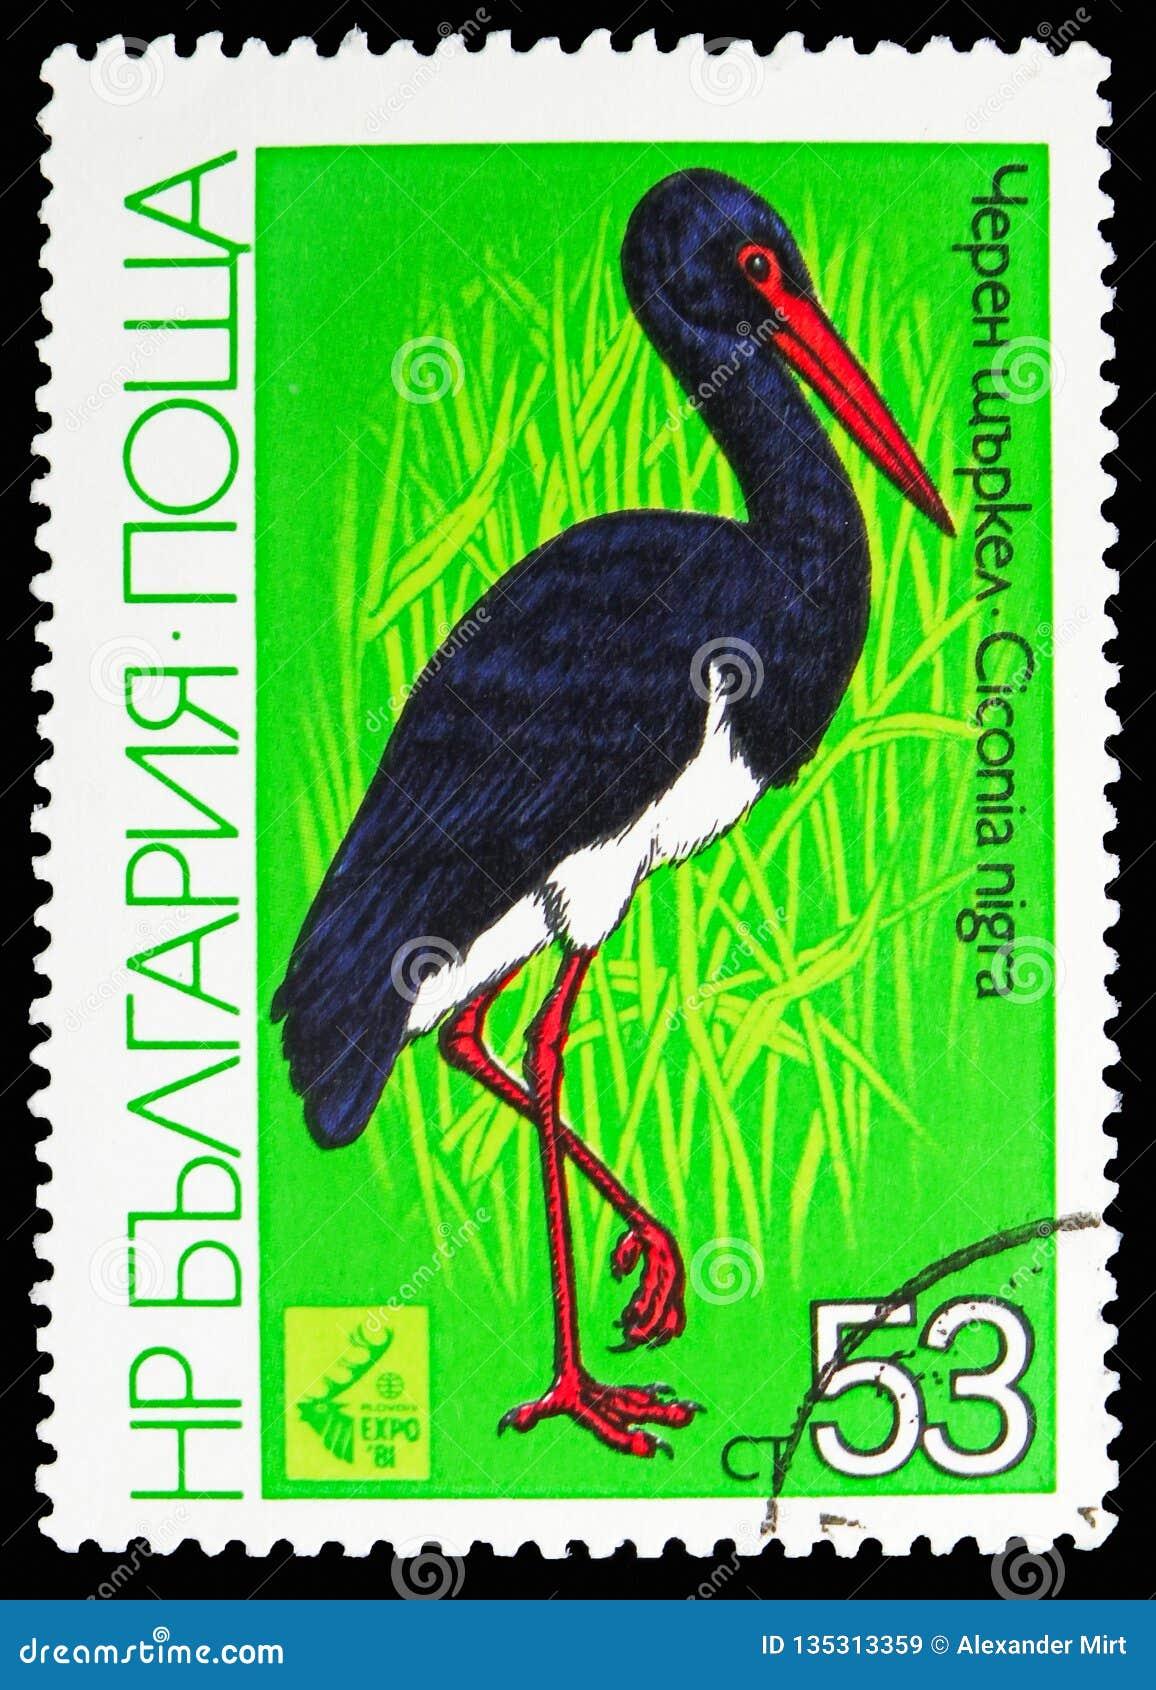 Black Stork (Ciconia nigra), International Hunting Exhibition EXPO  81, Plovdiv: Waders serie, circa 1981